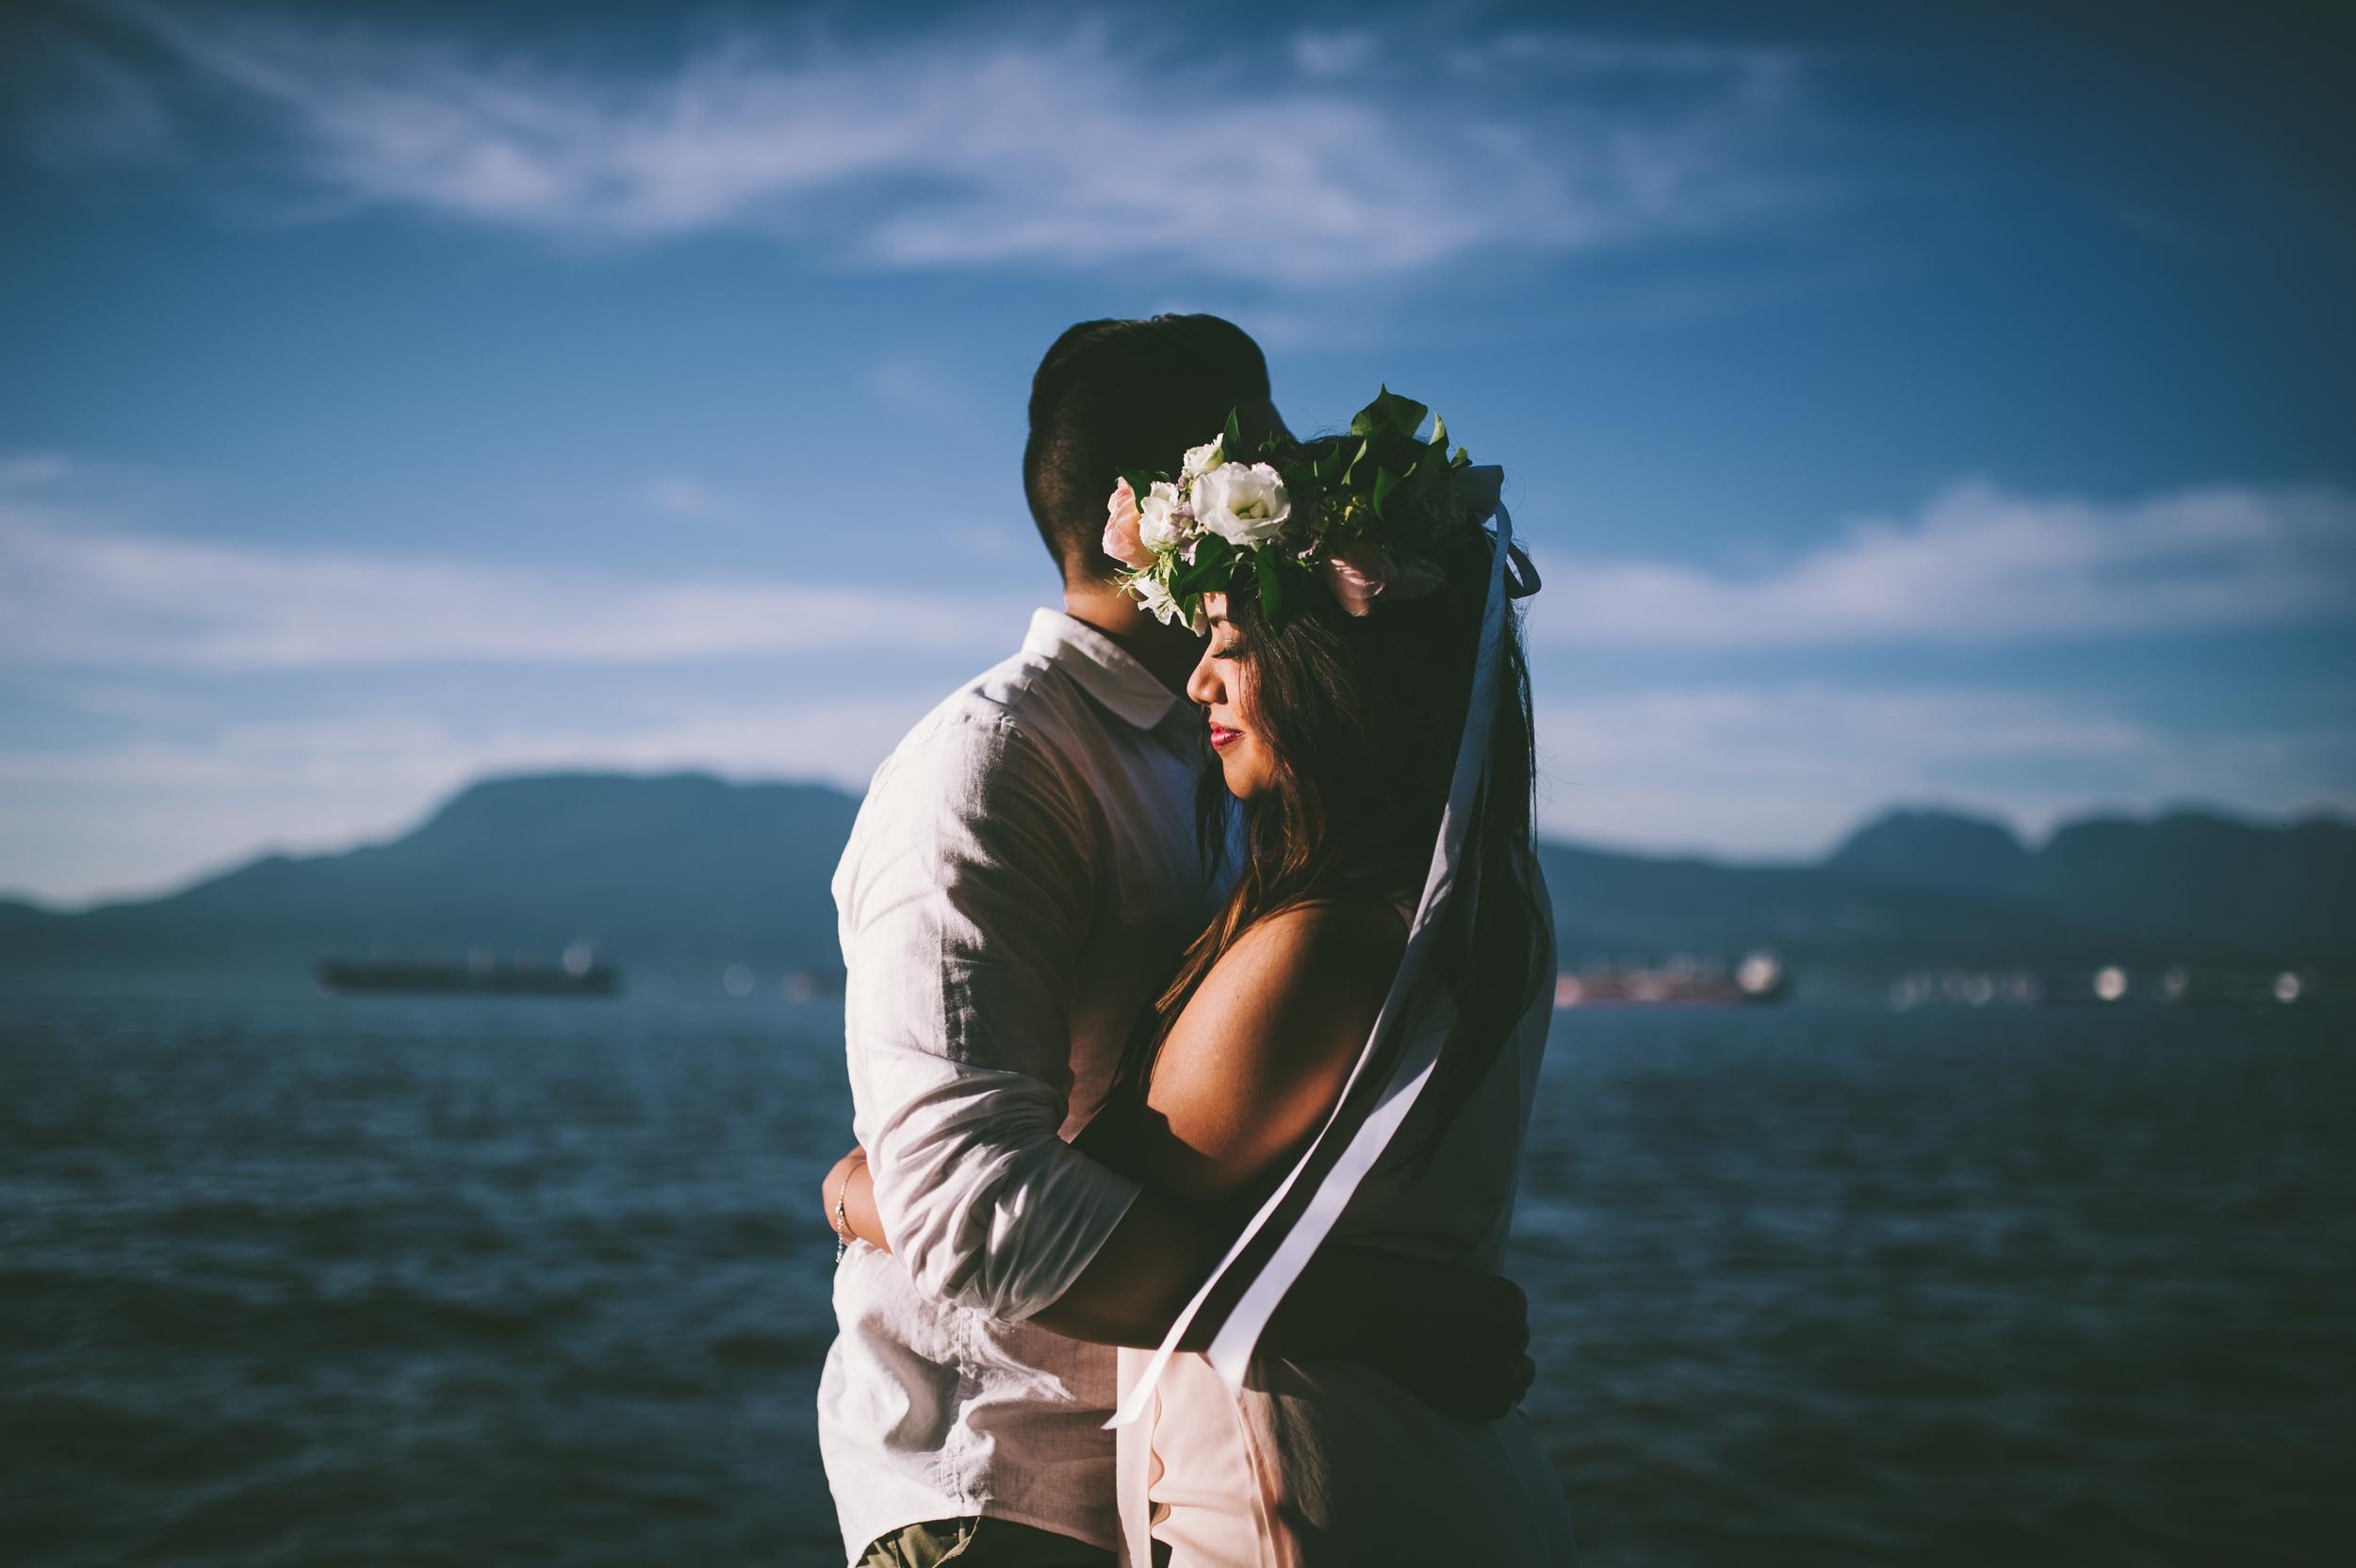 Ricardo & Stephanie - Engagement - © Dallas Kolotylo Photography - 83.jpg